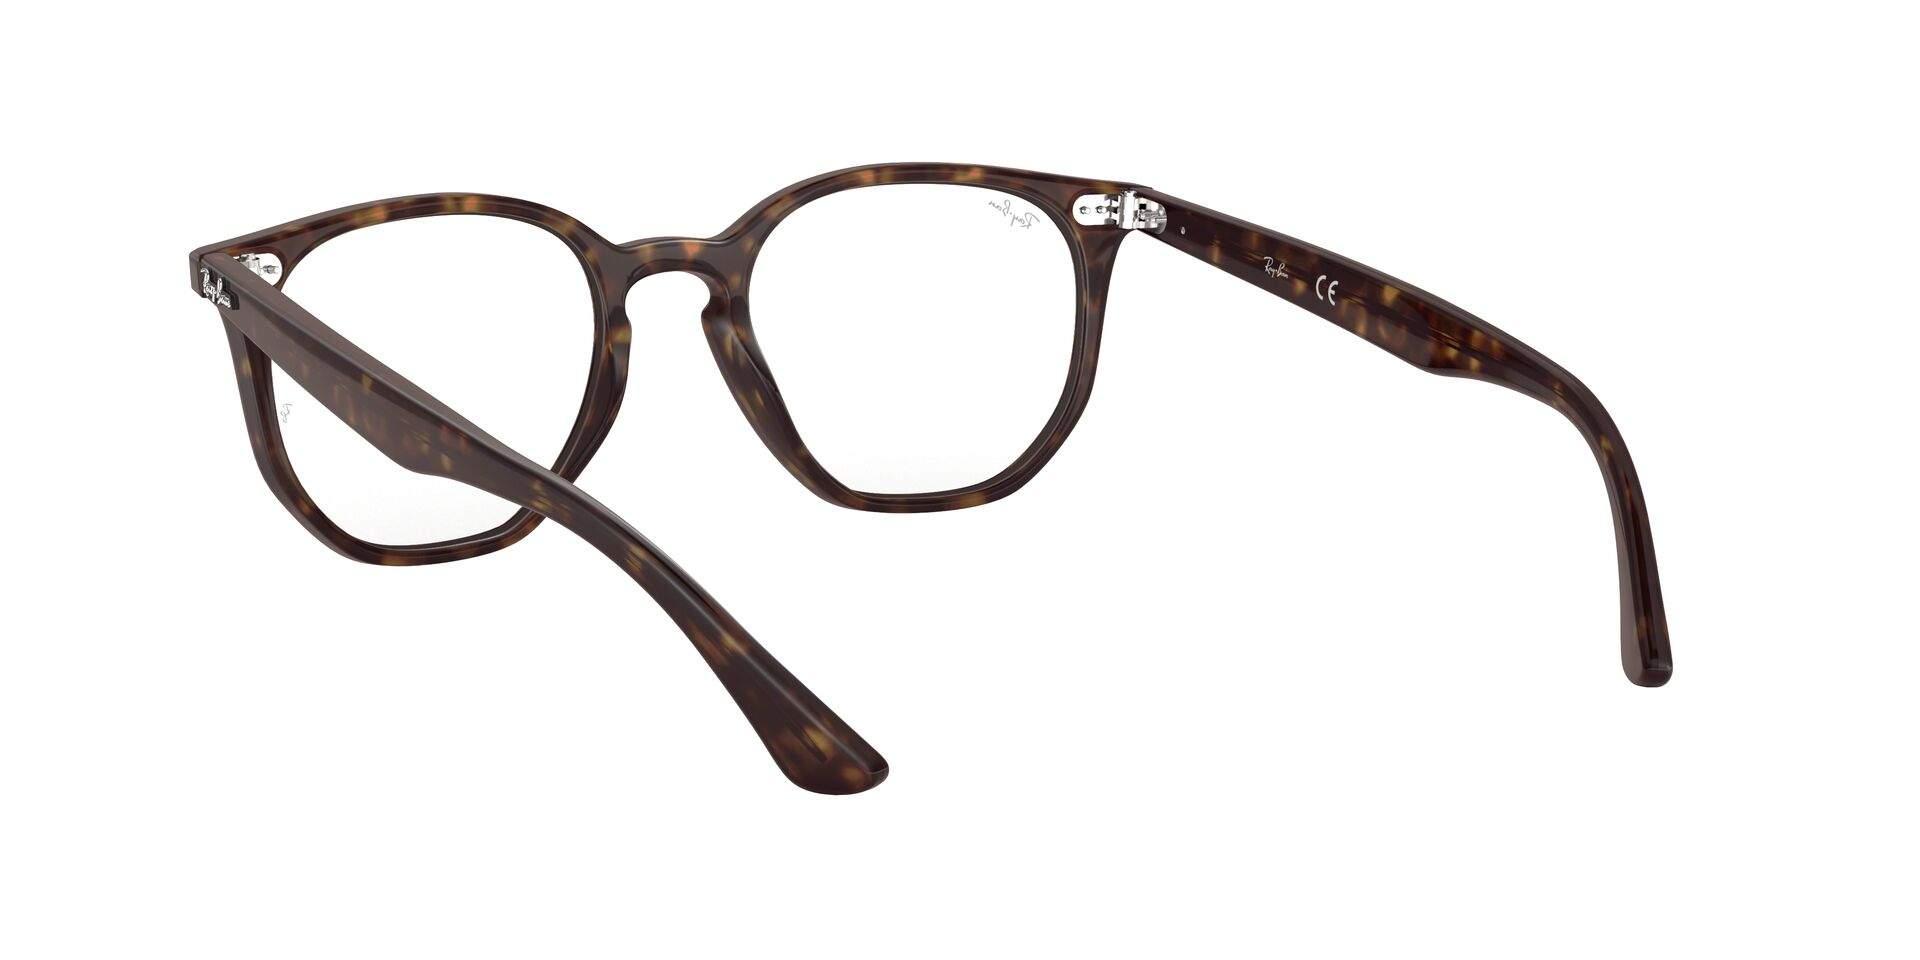 6b18348c80 Eyeglasses Ray-Ban Hexagonal Optics Tortoise RX7151 2012 50-19 Medium